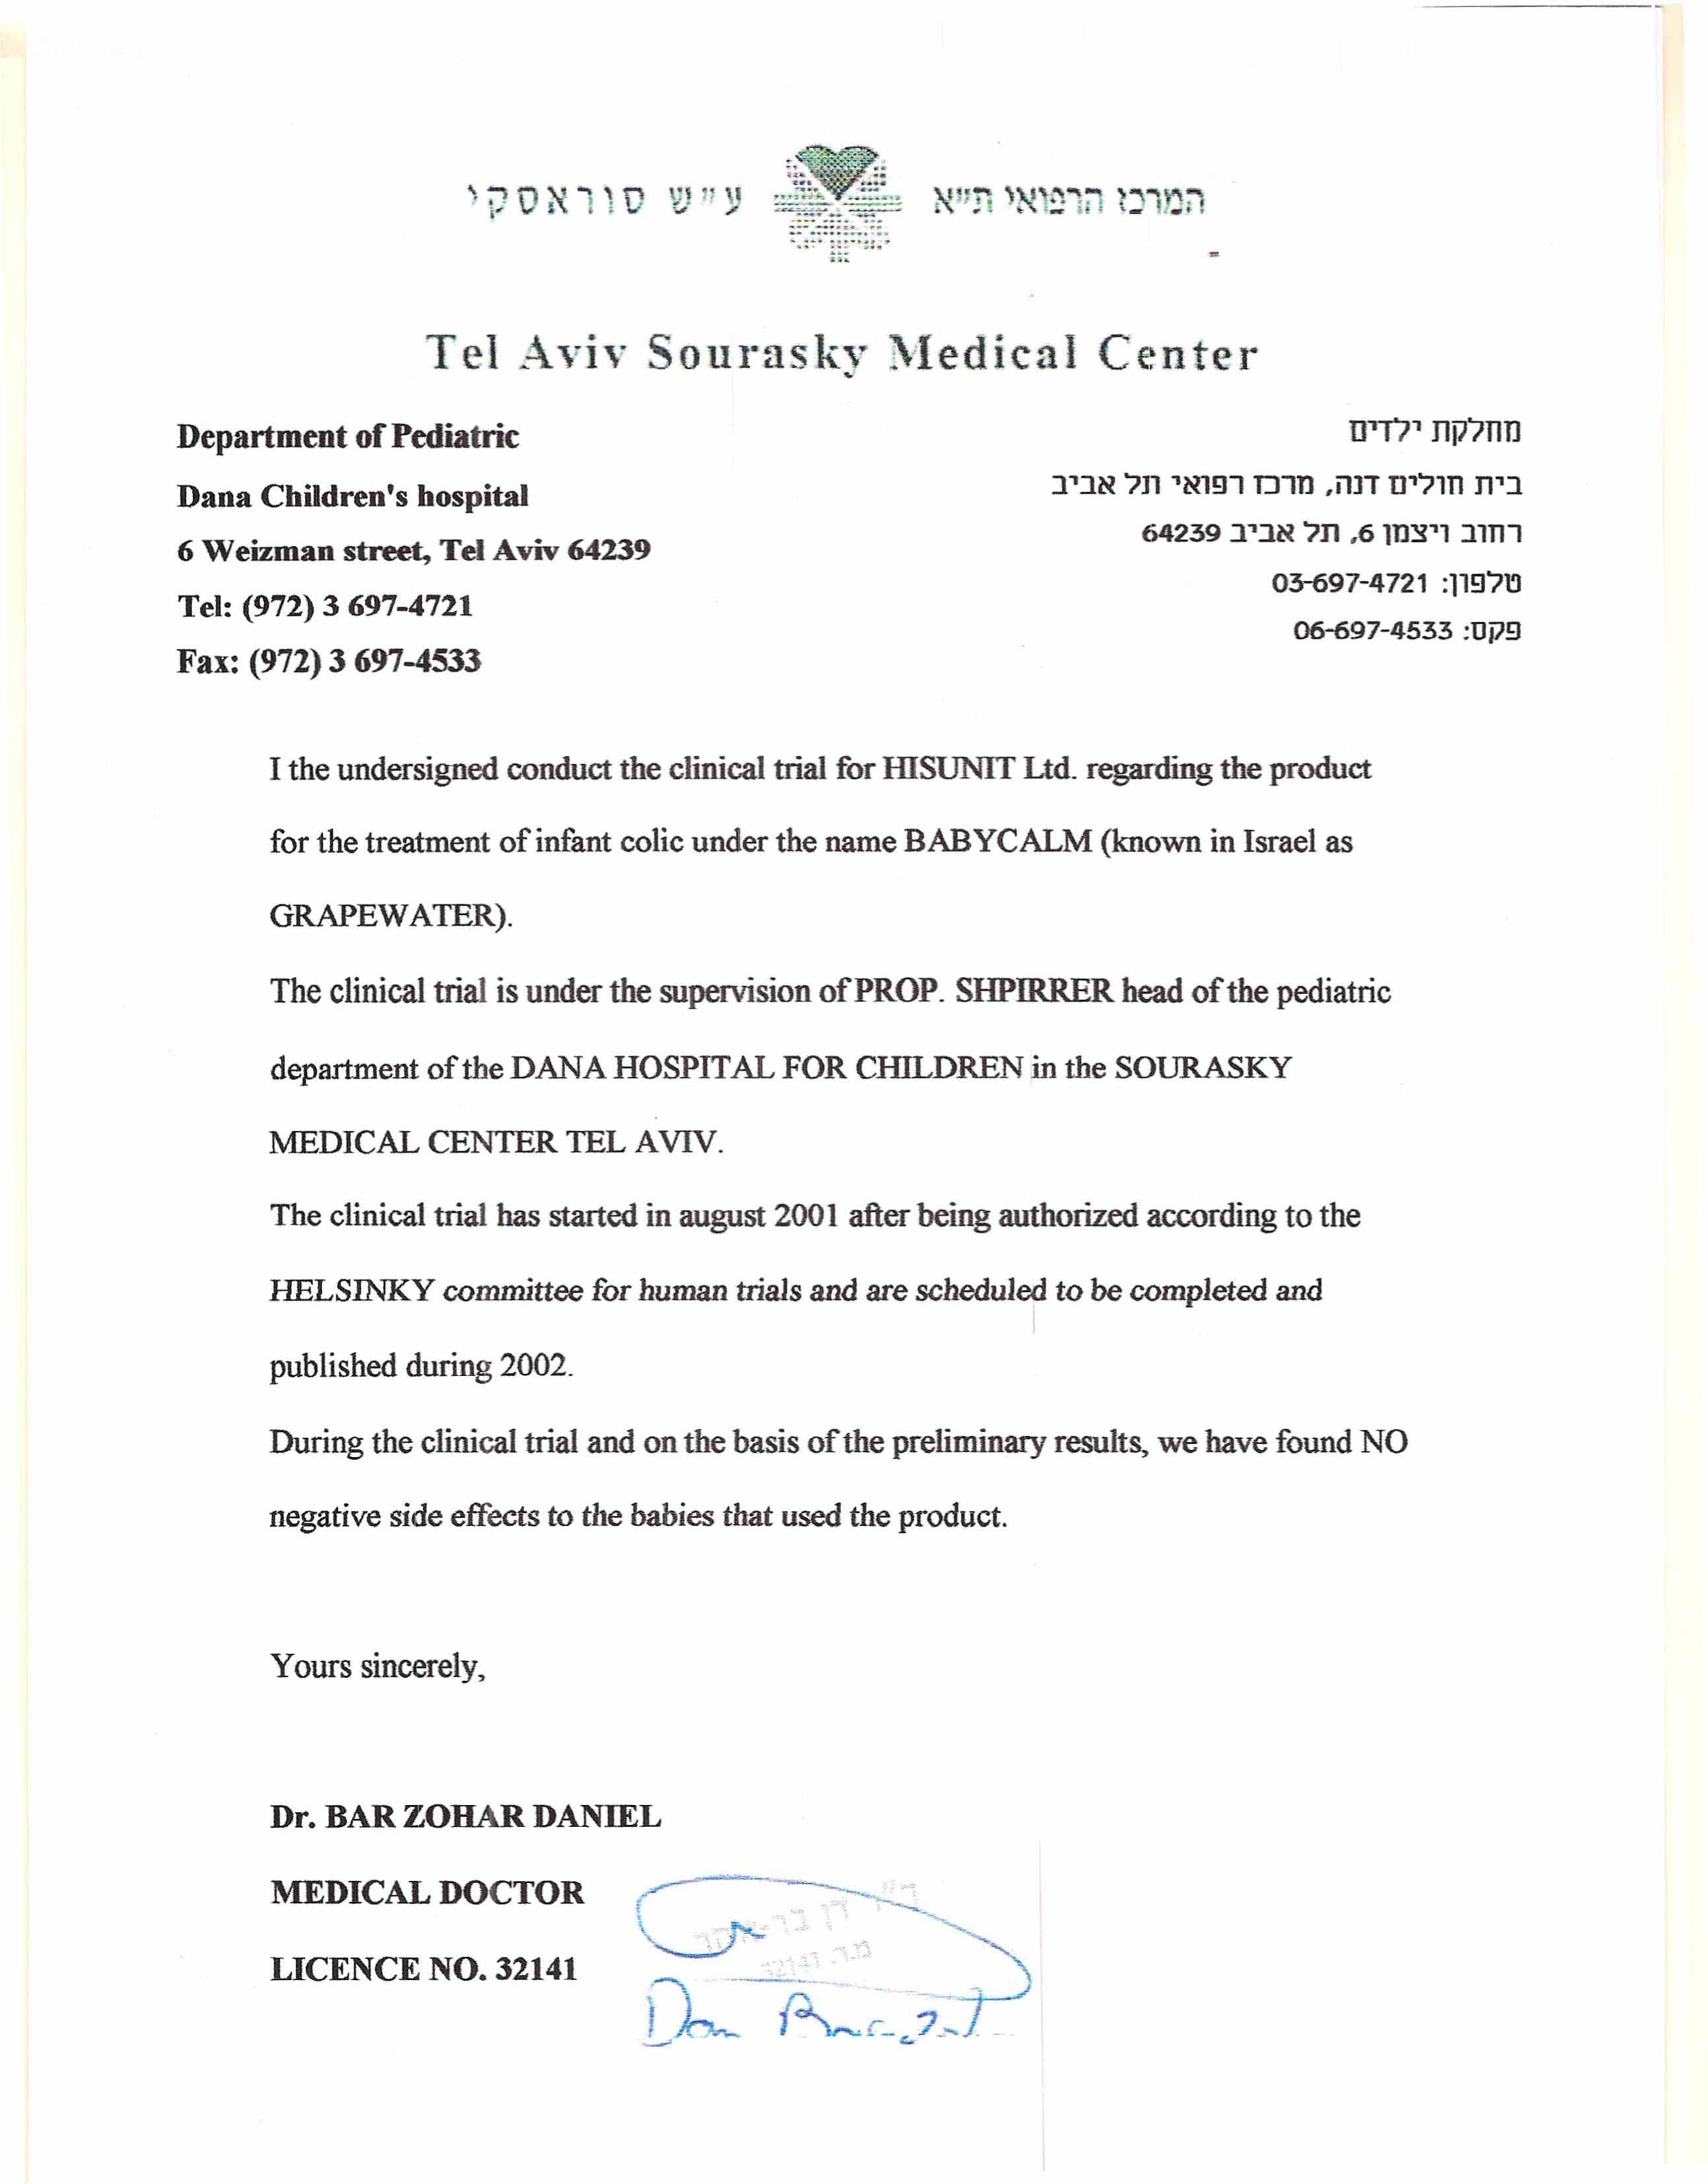 letter-from-dr.bar-zohar